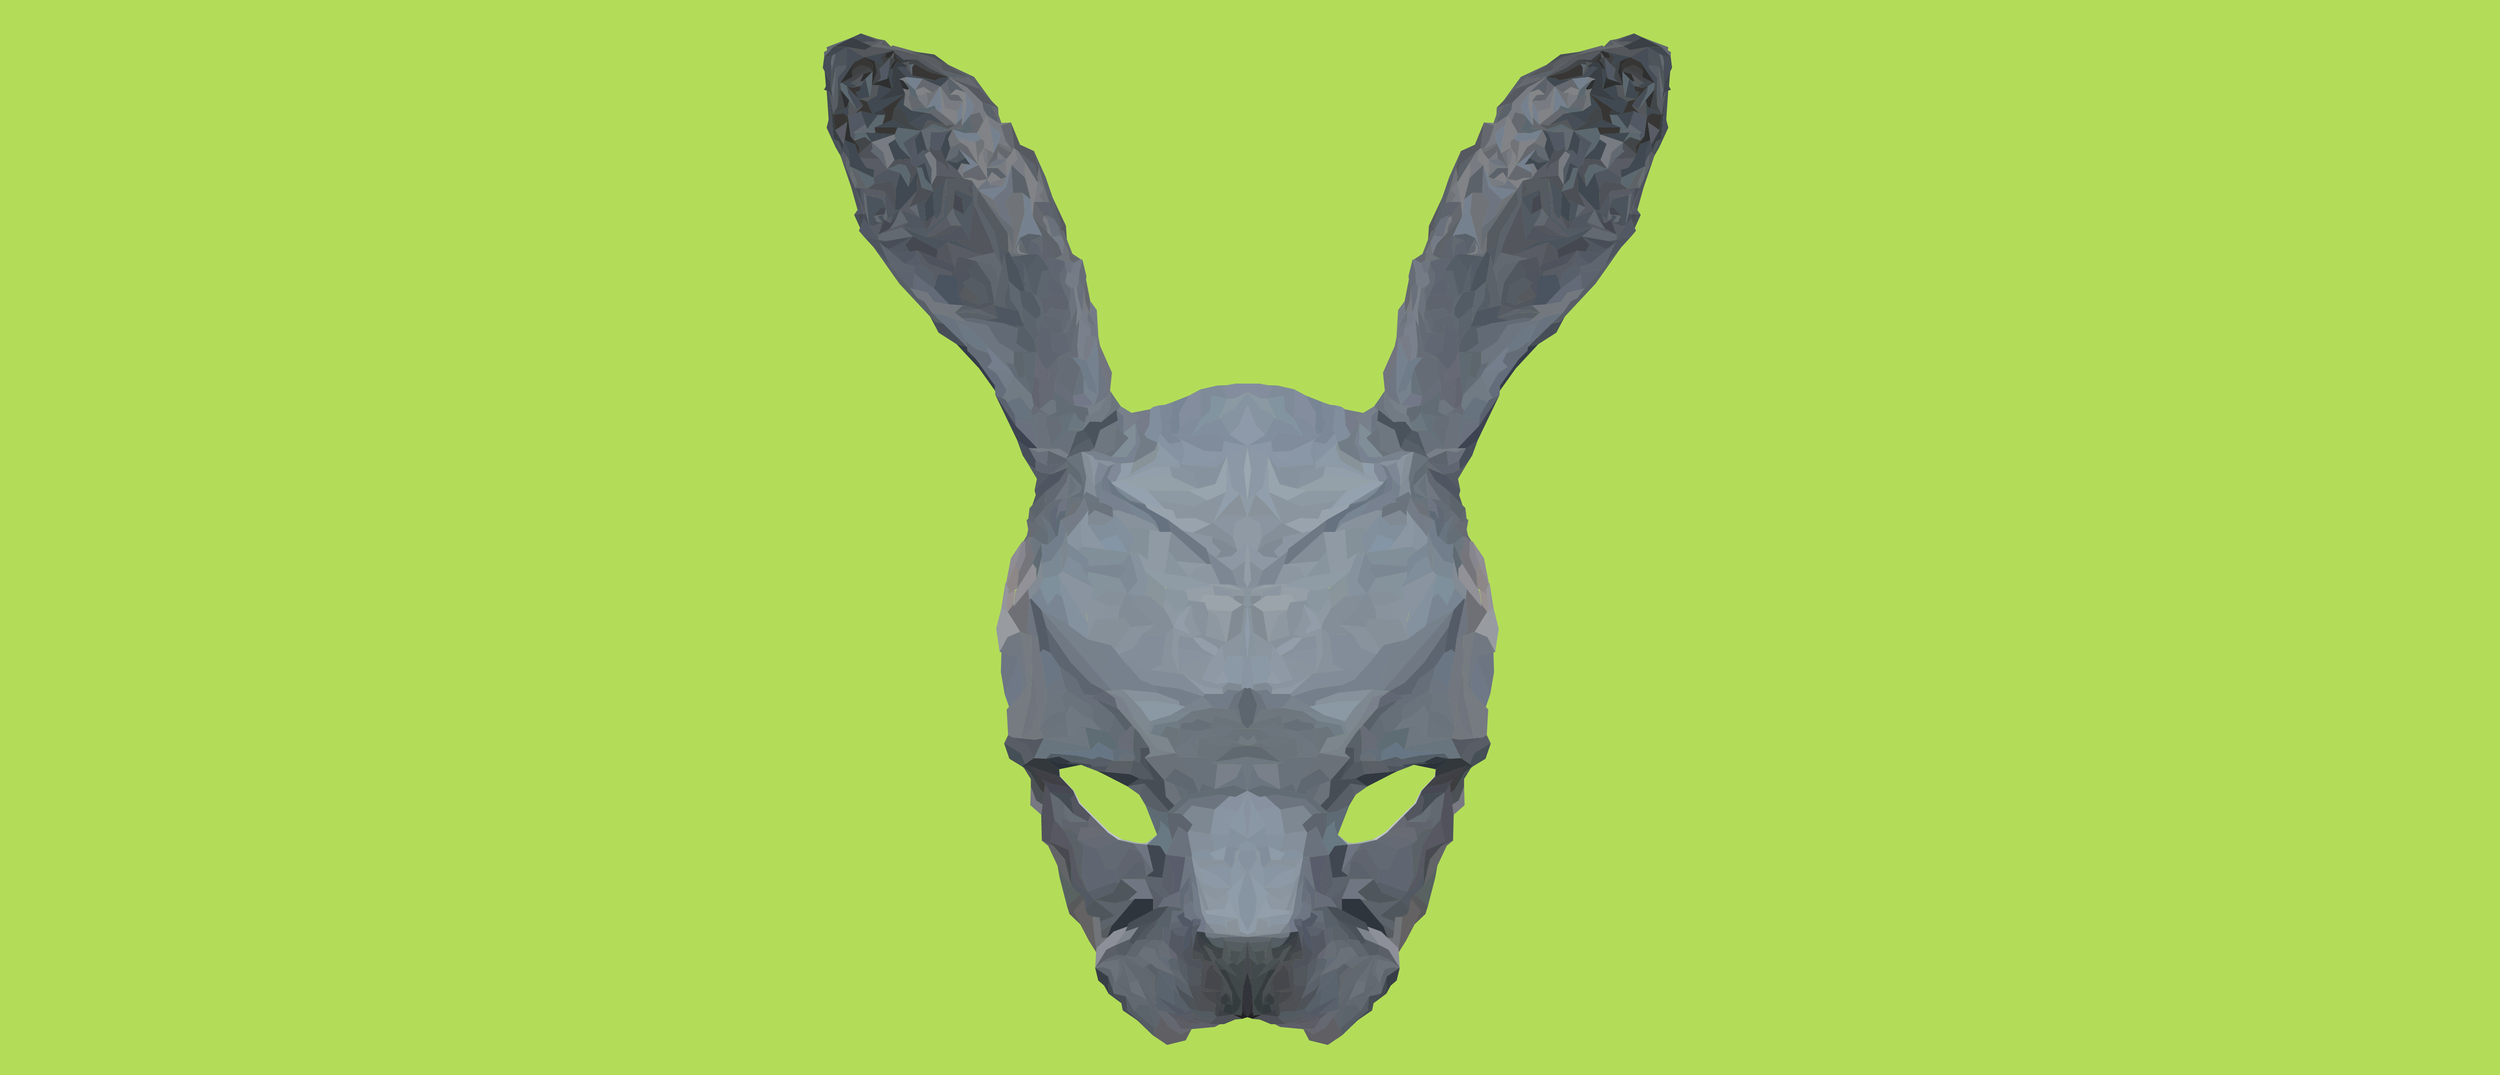 rabbit-01.png